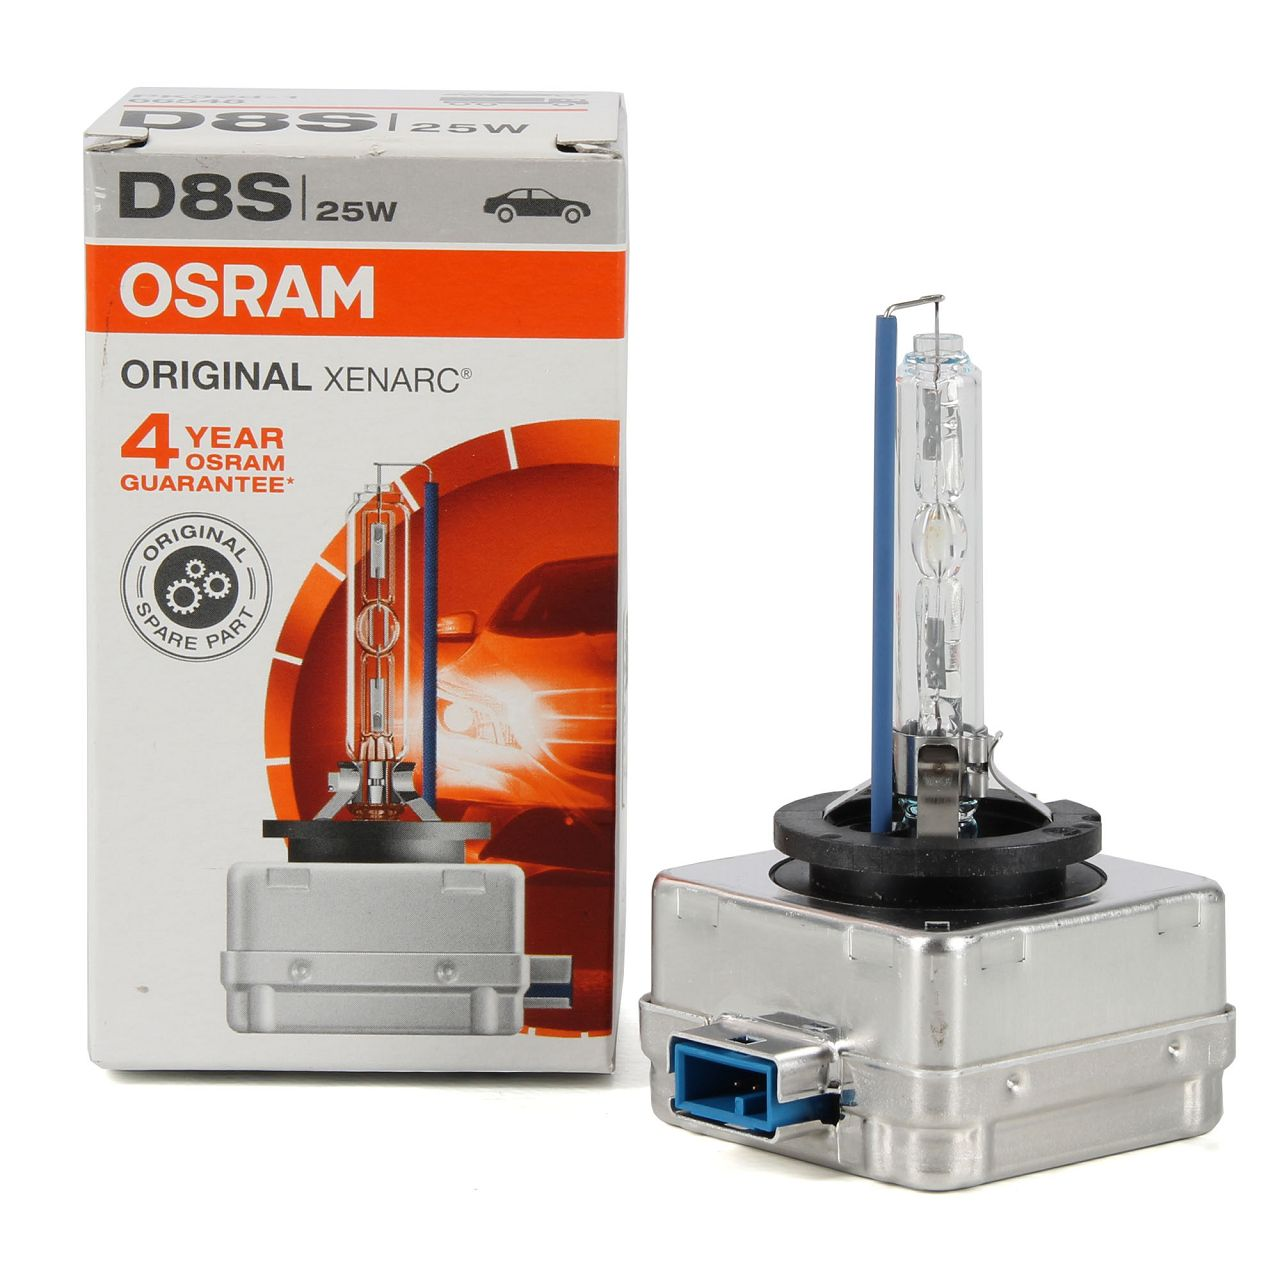 OSRAM 66548 Xenarc Xenon Brenner D8S ORIGINAL 42V 25W PK32d-1